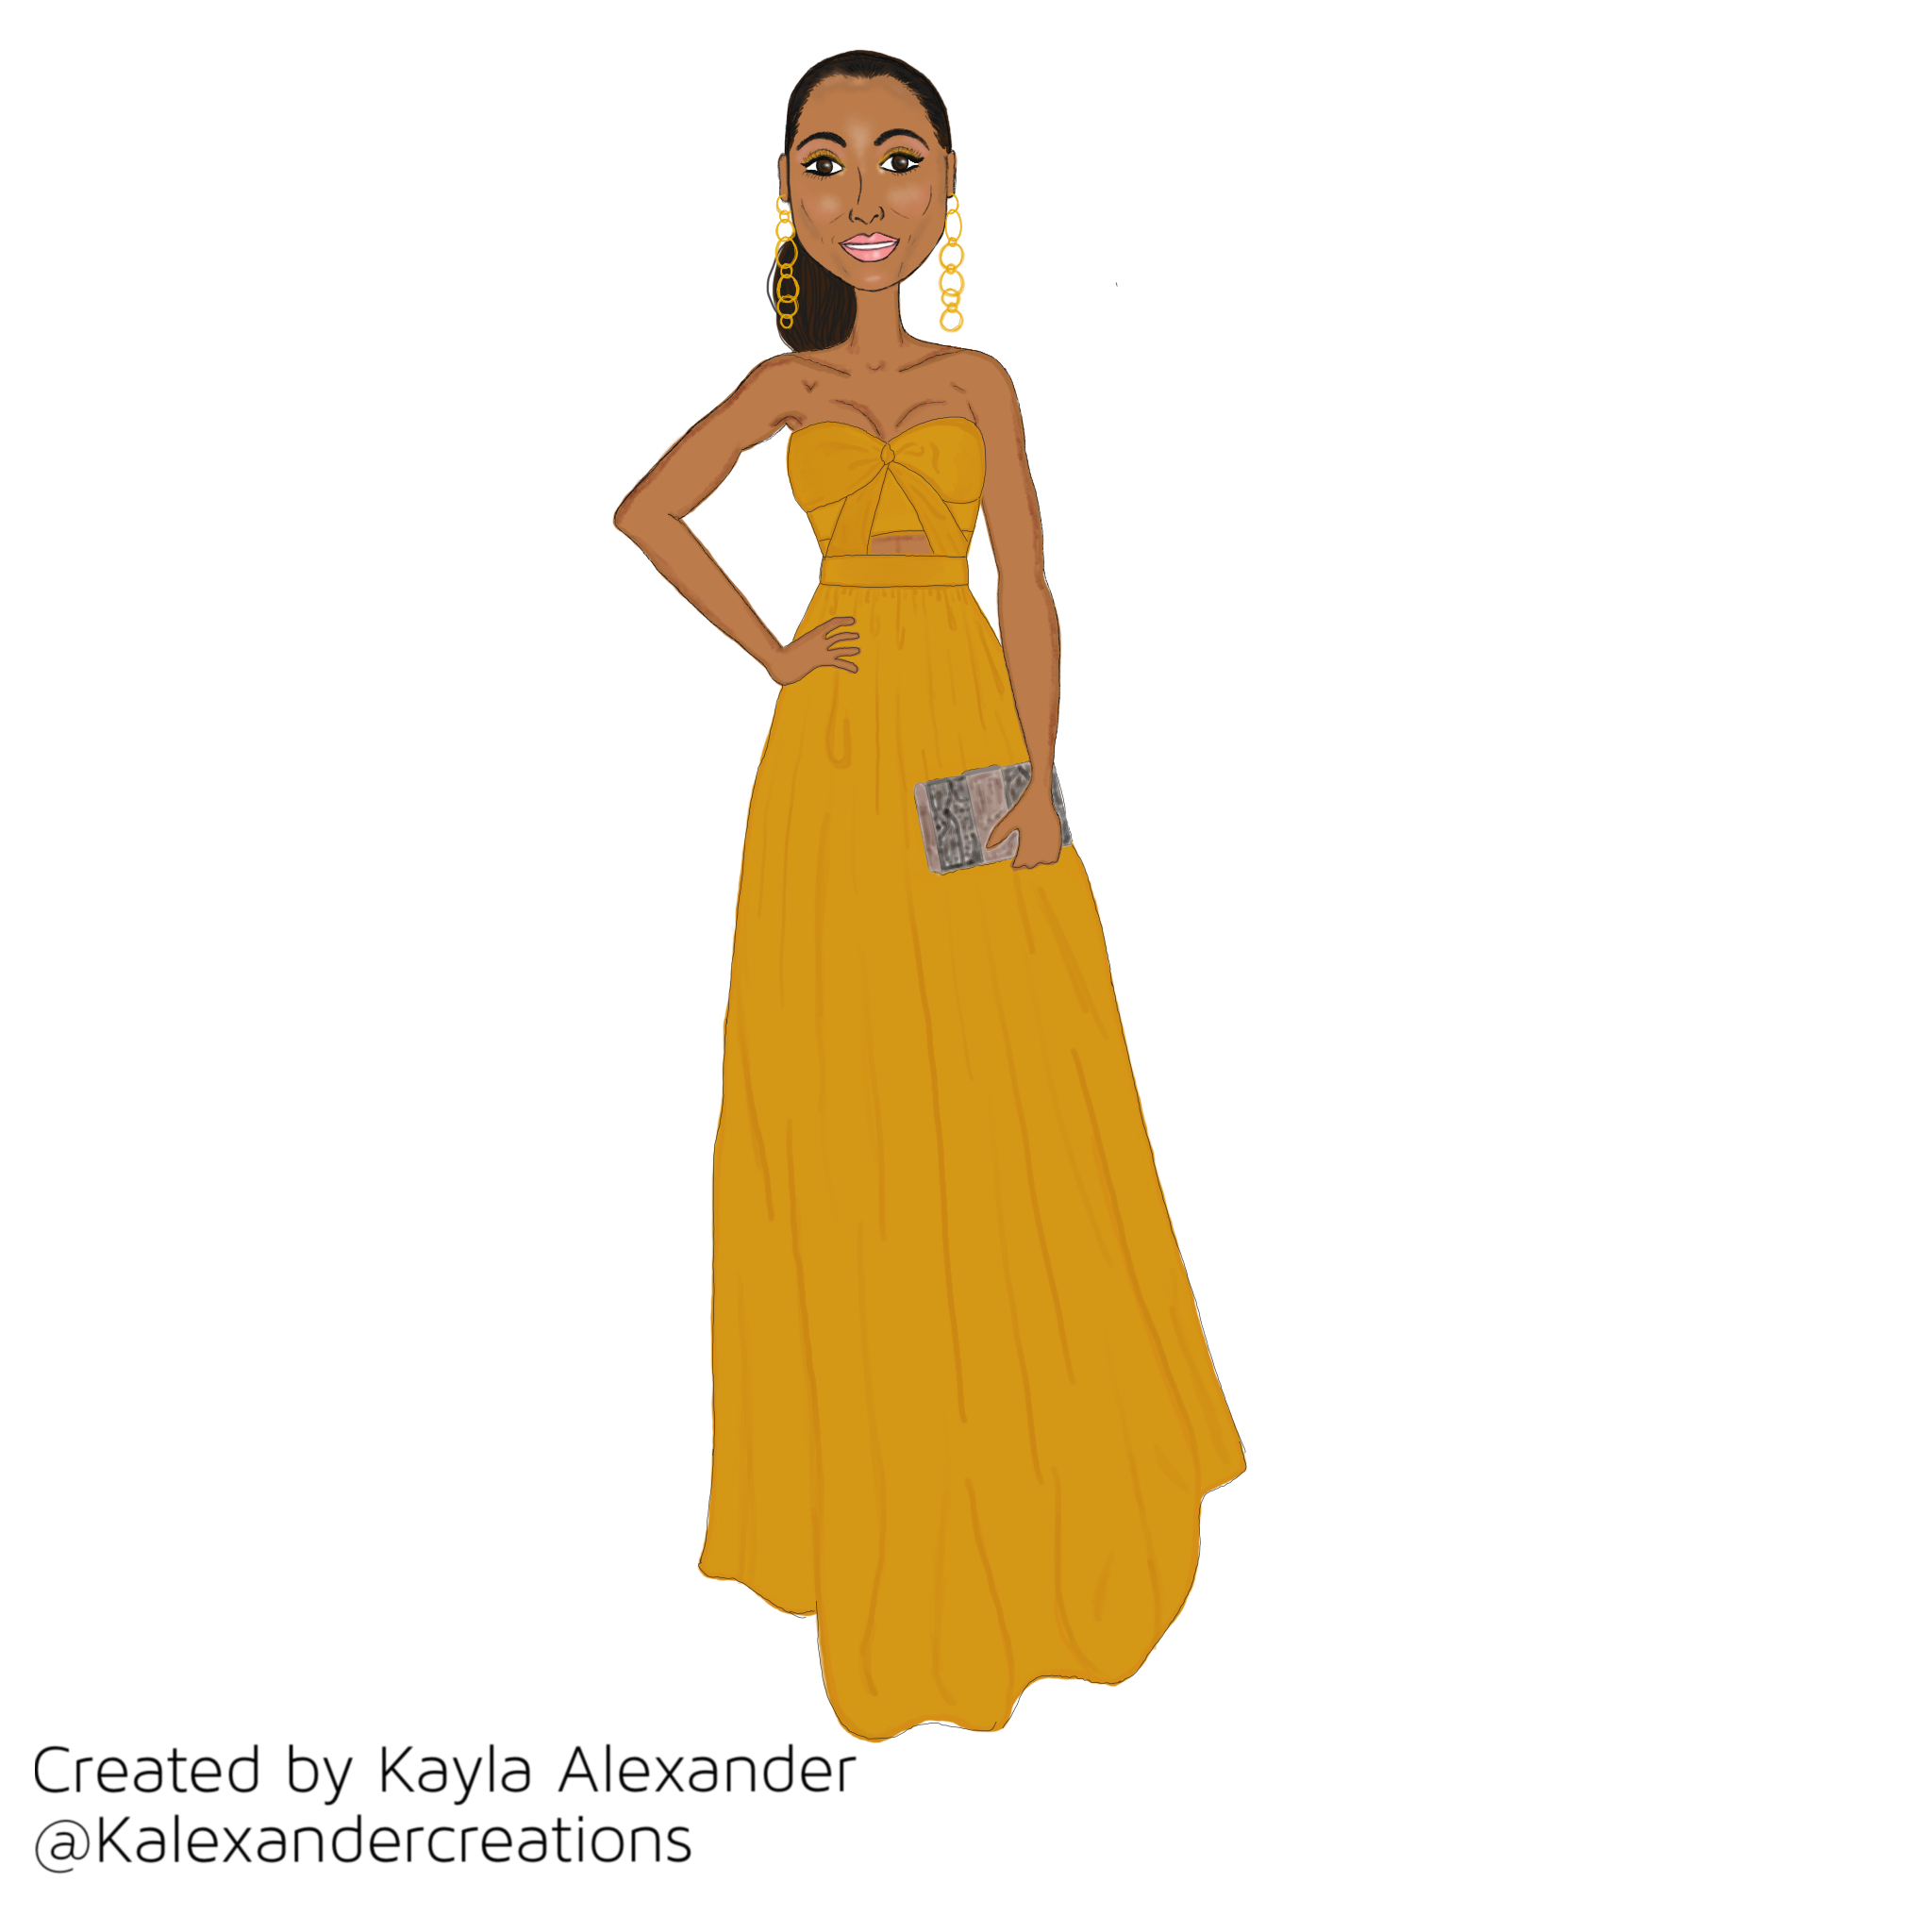 Golden girl Skylar Diggins-Smith in a Jay Godfrey dress.